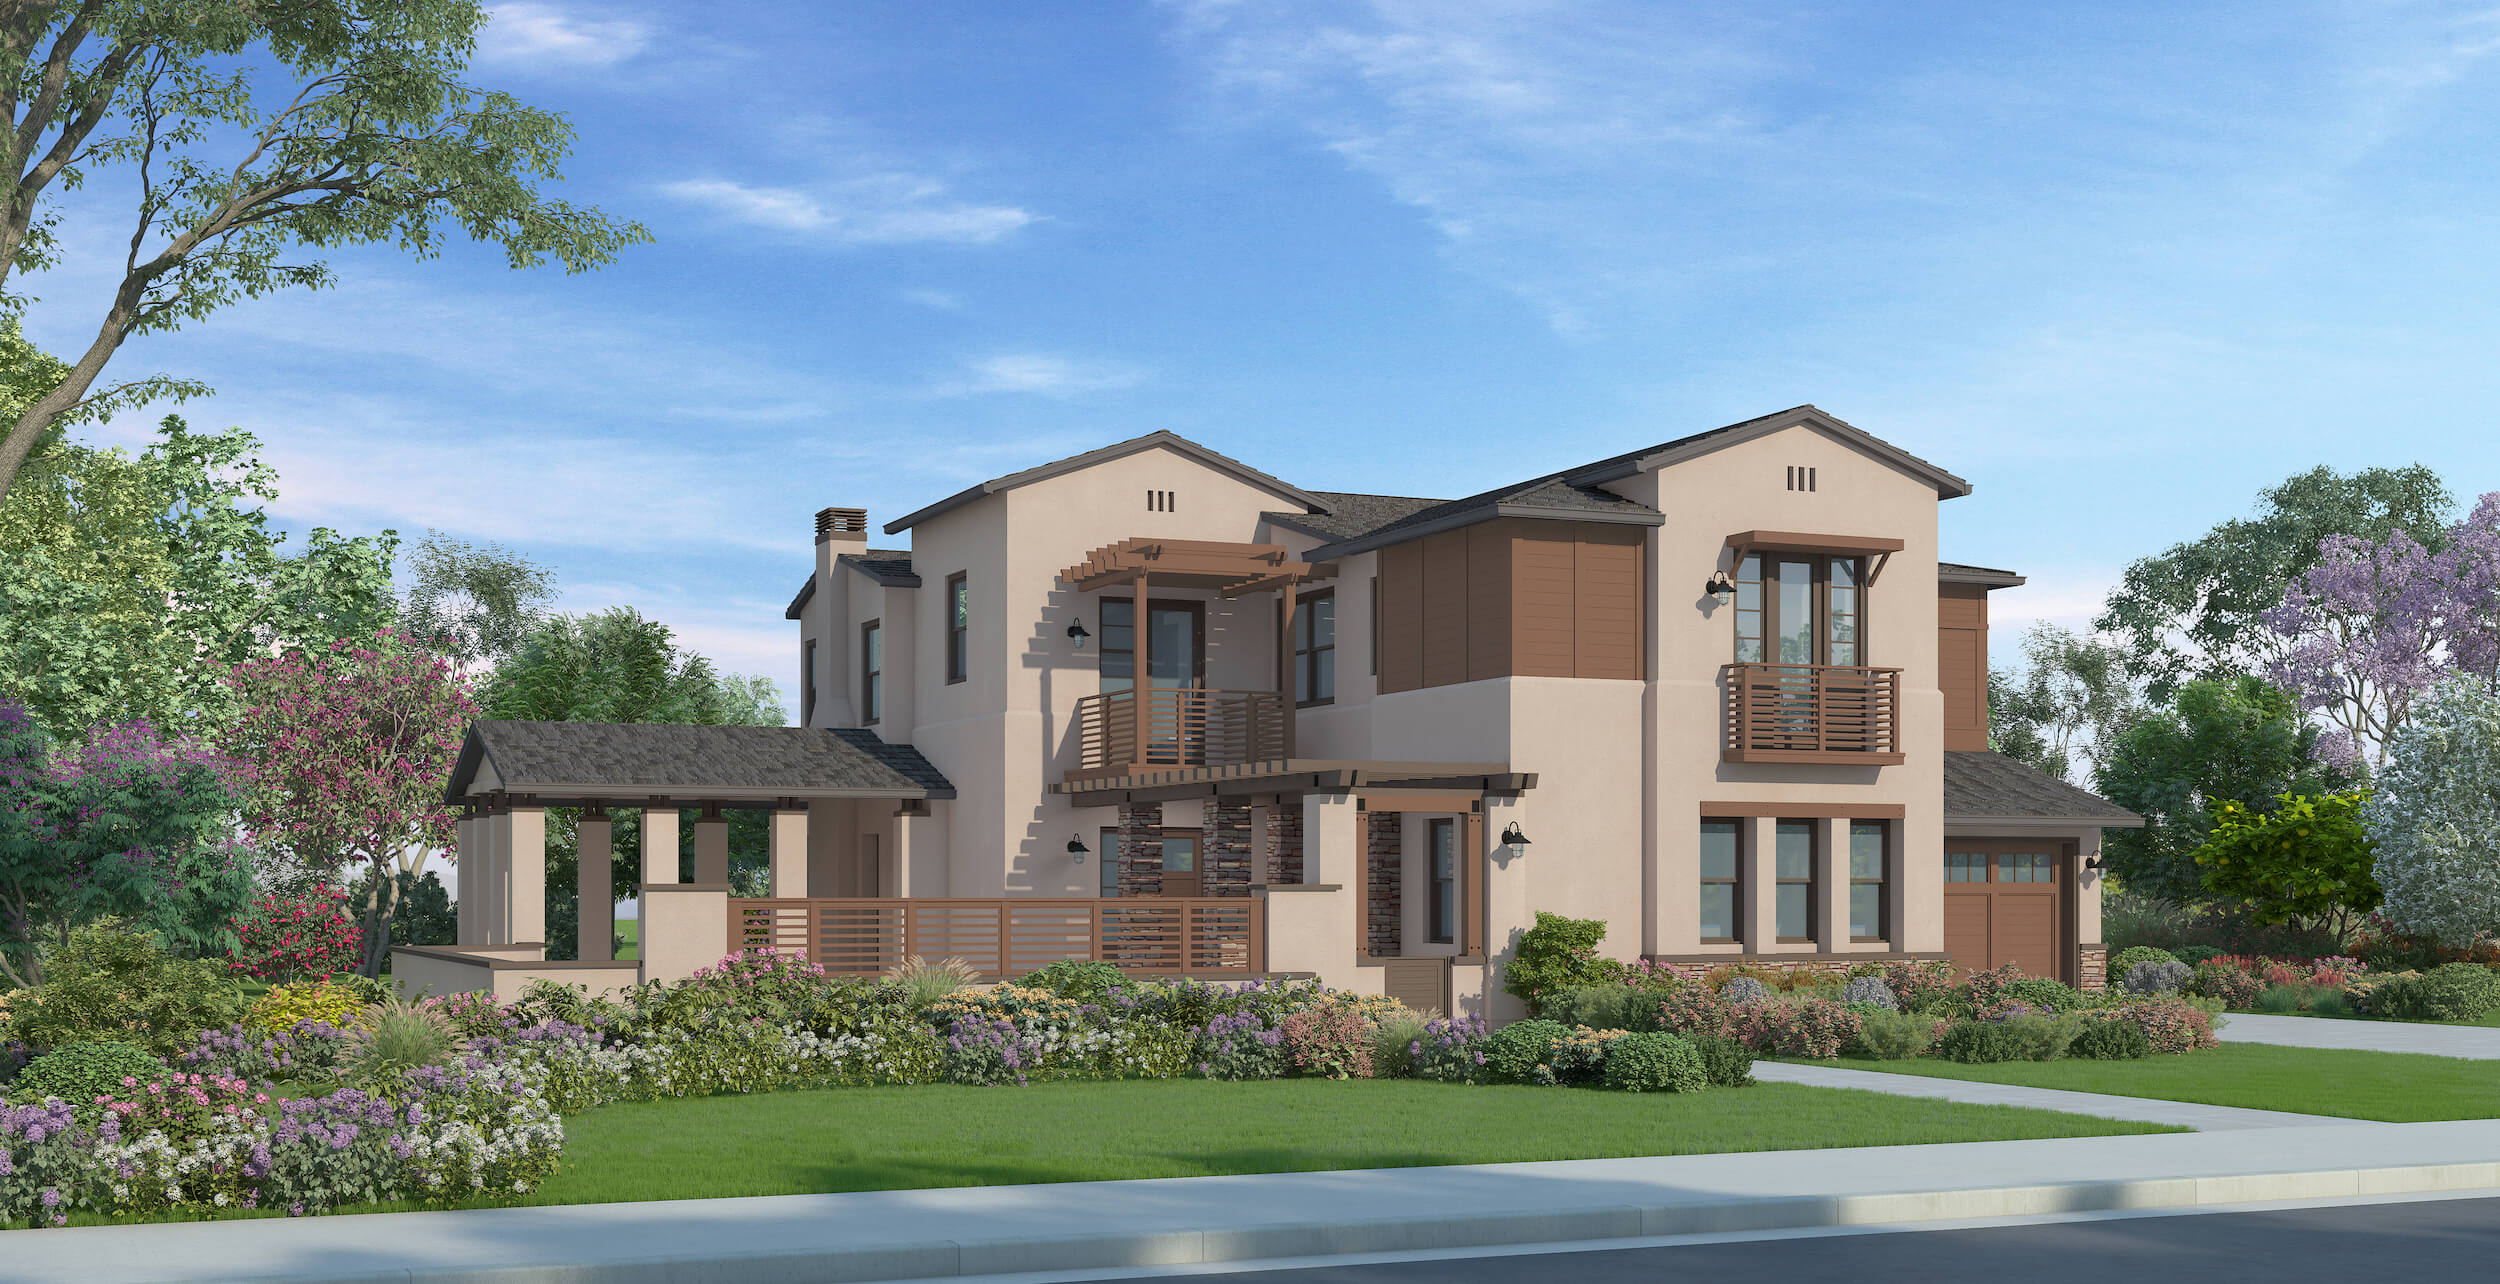 Plan 4A - California Ranch - 4,487 sf